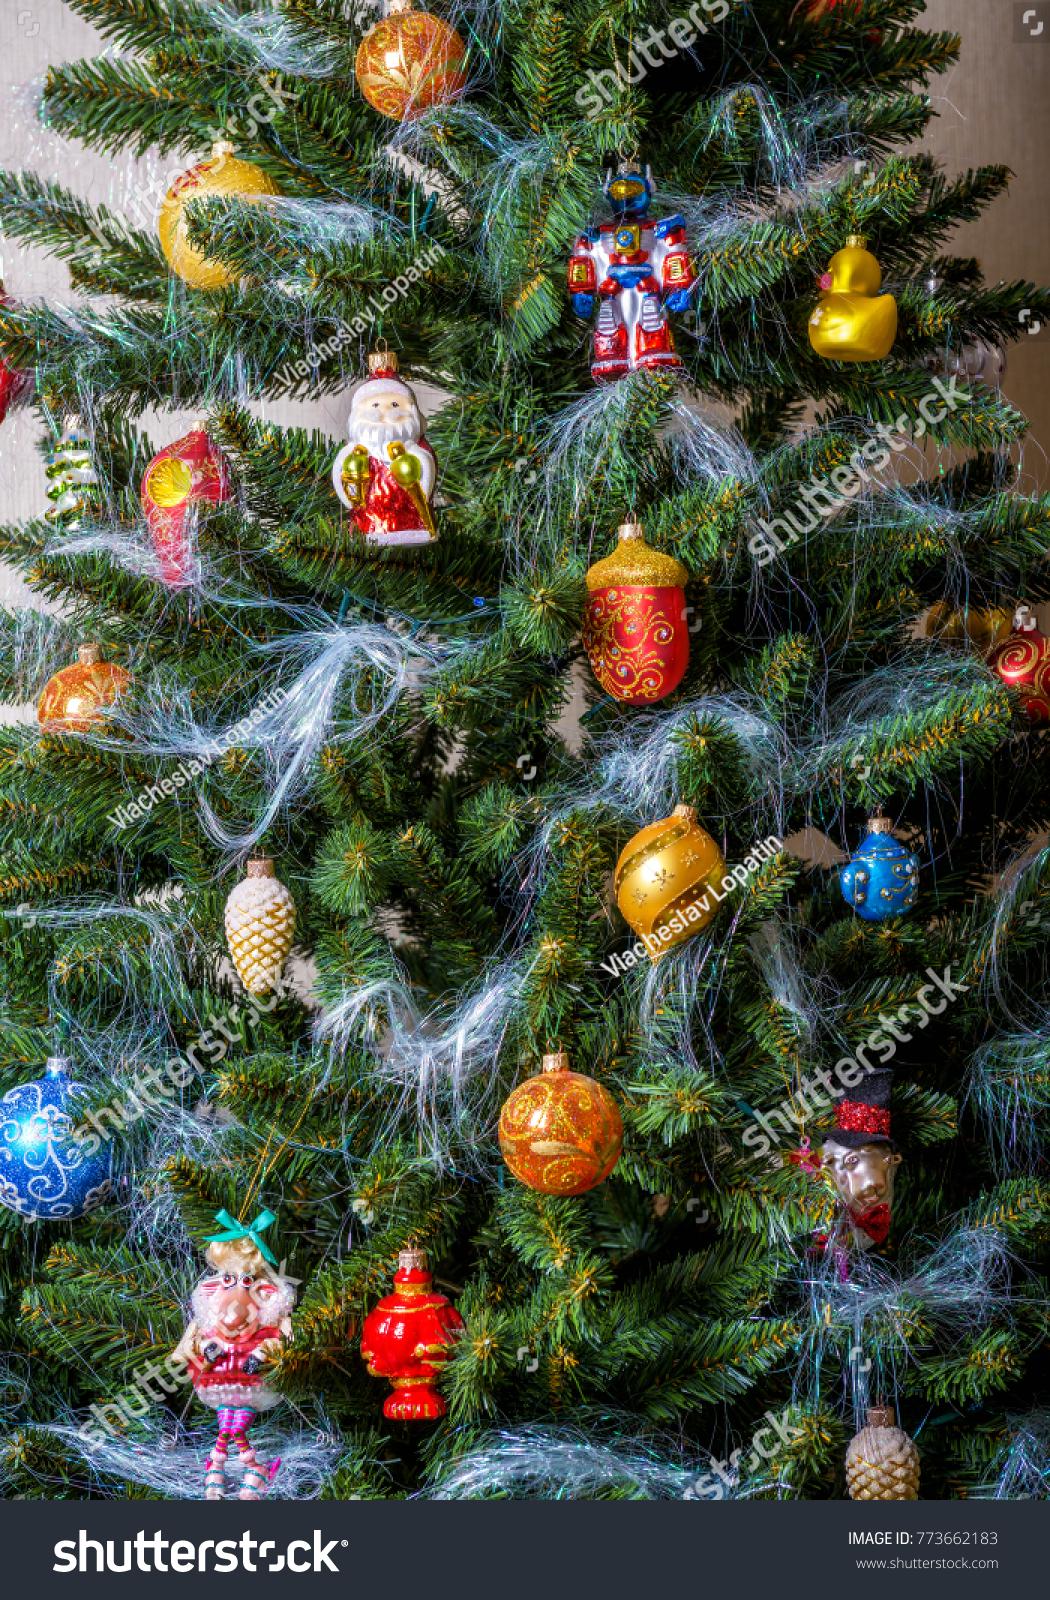 Christmas Tree Decorations Home Colorful Christmas Stock Photo Edit Now 773662183